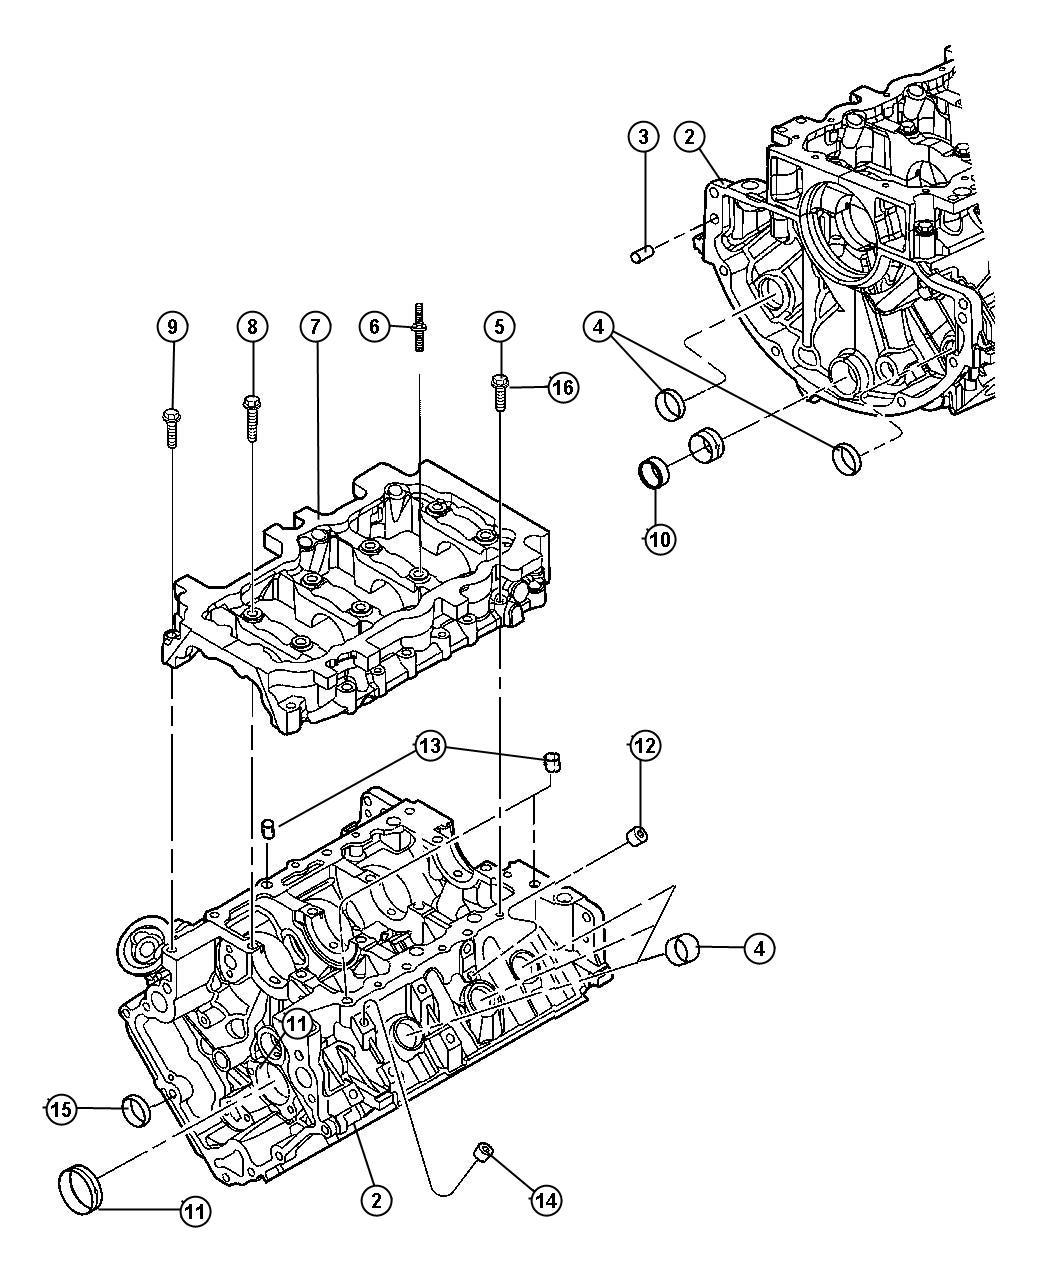 2006 Jeep Commander Engine. Long block. Remanufactured